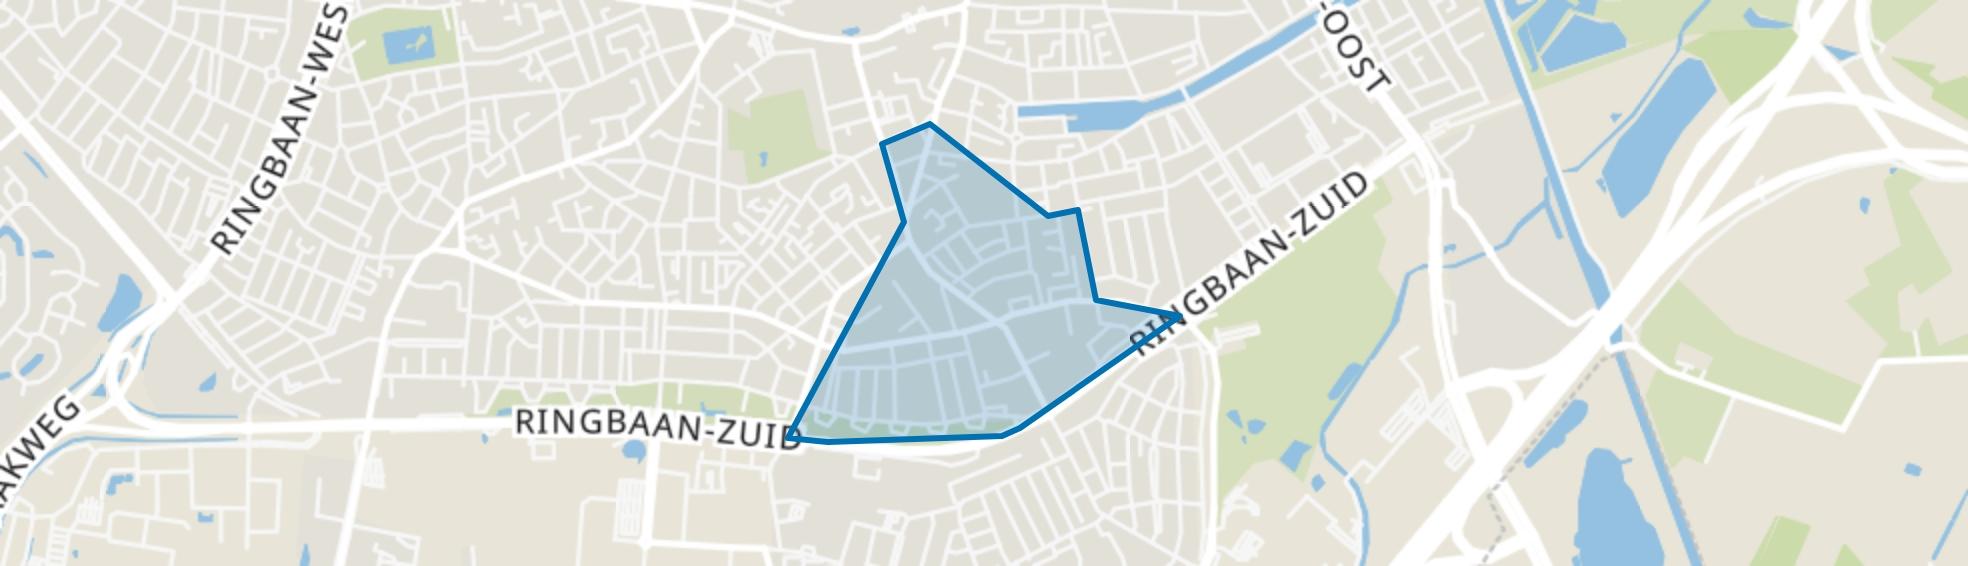 Broekhoven, Tilburg map